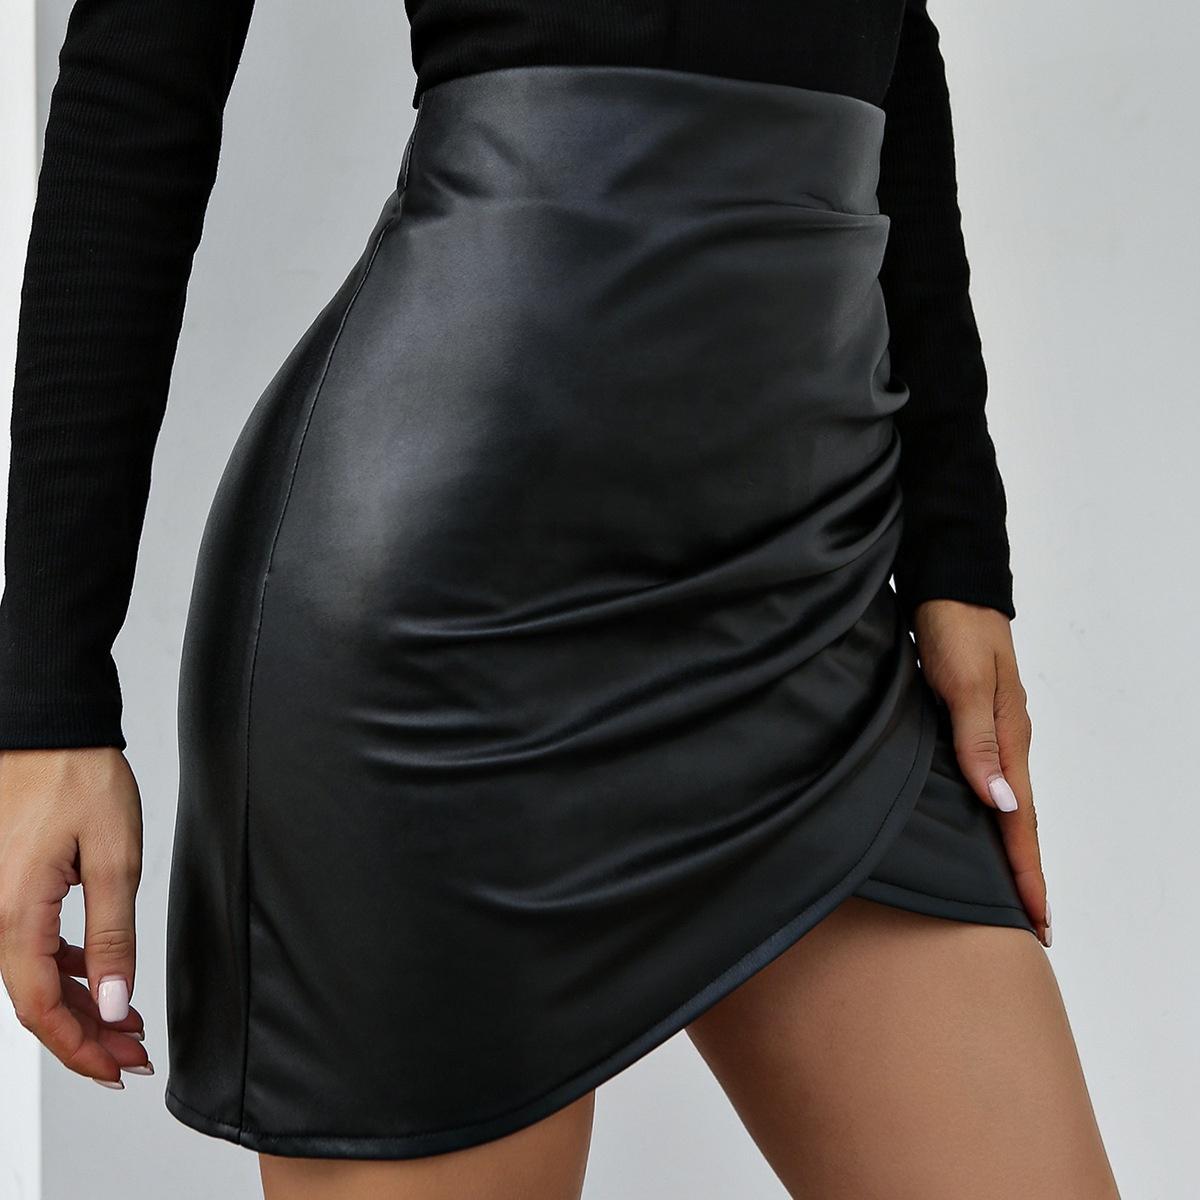 tiny mini skirt hot chick at mcdonald